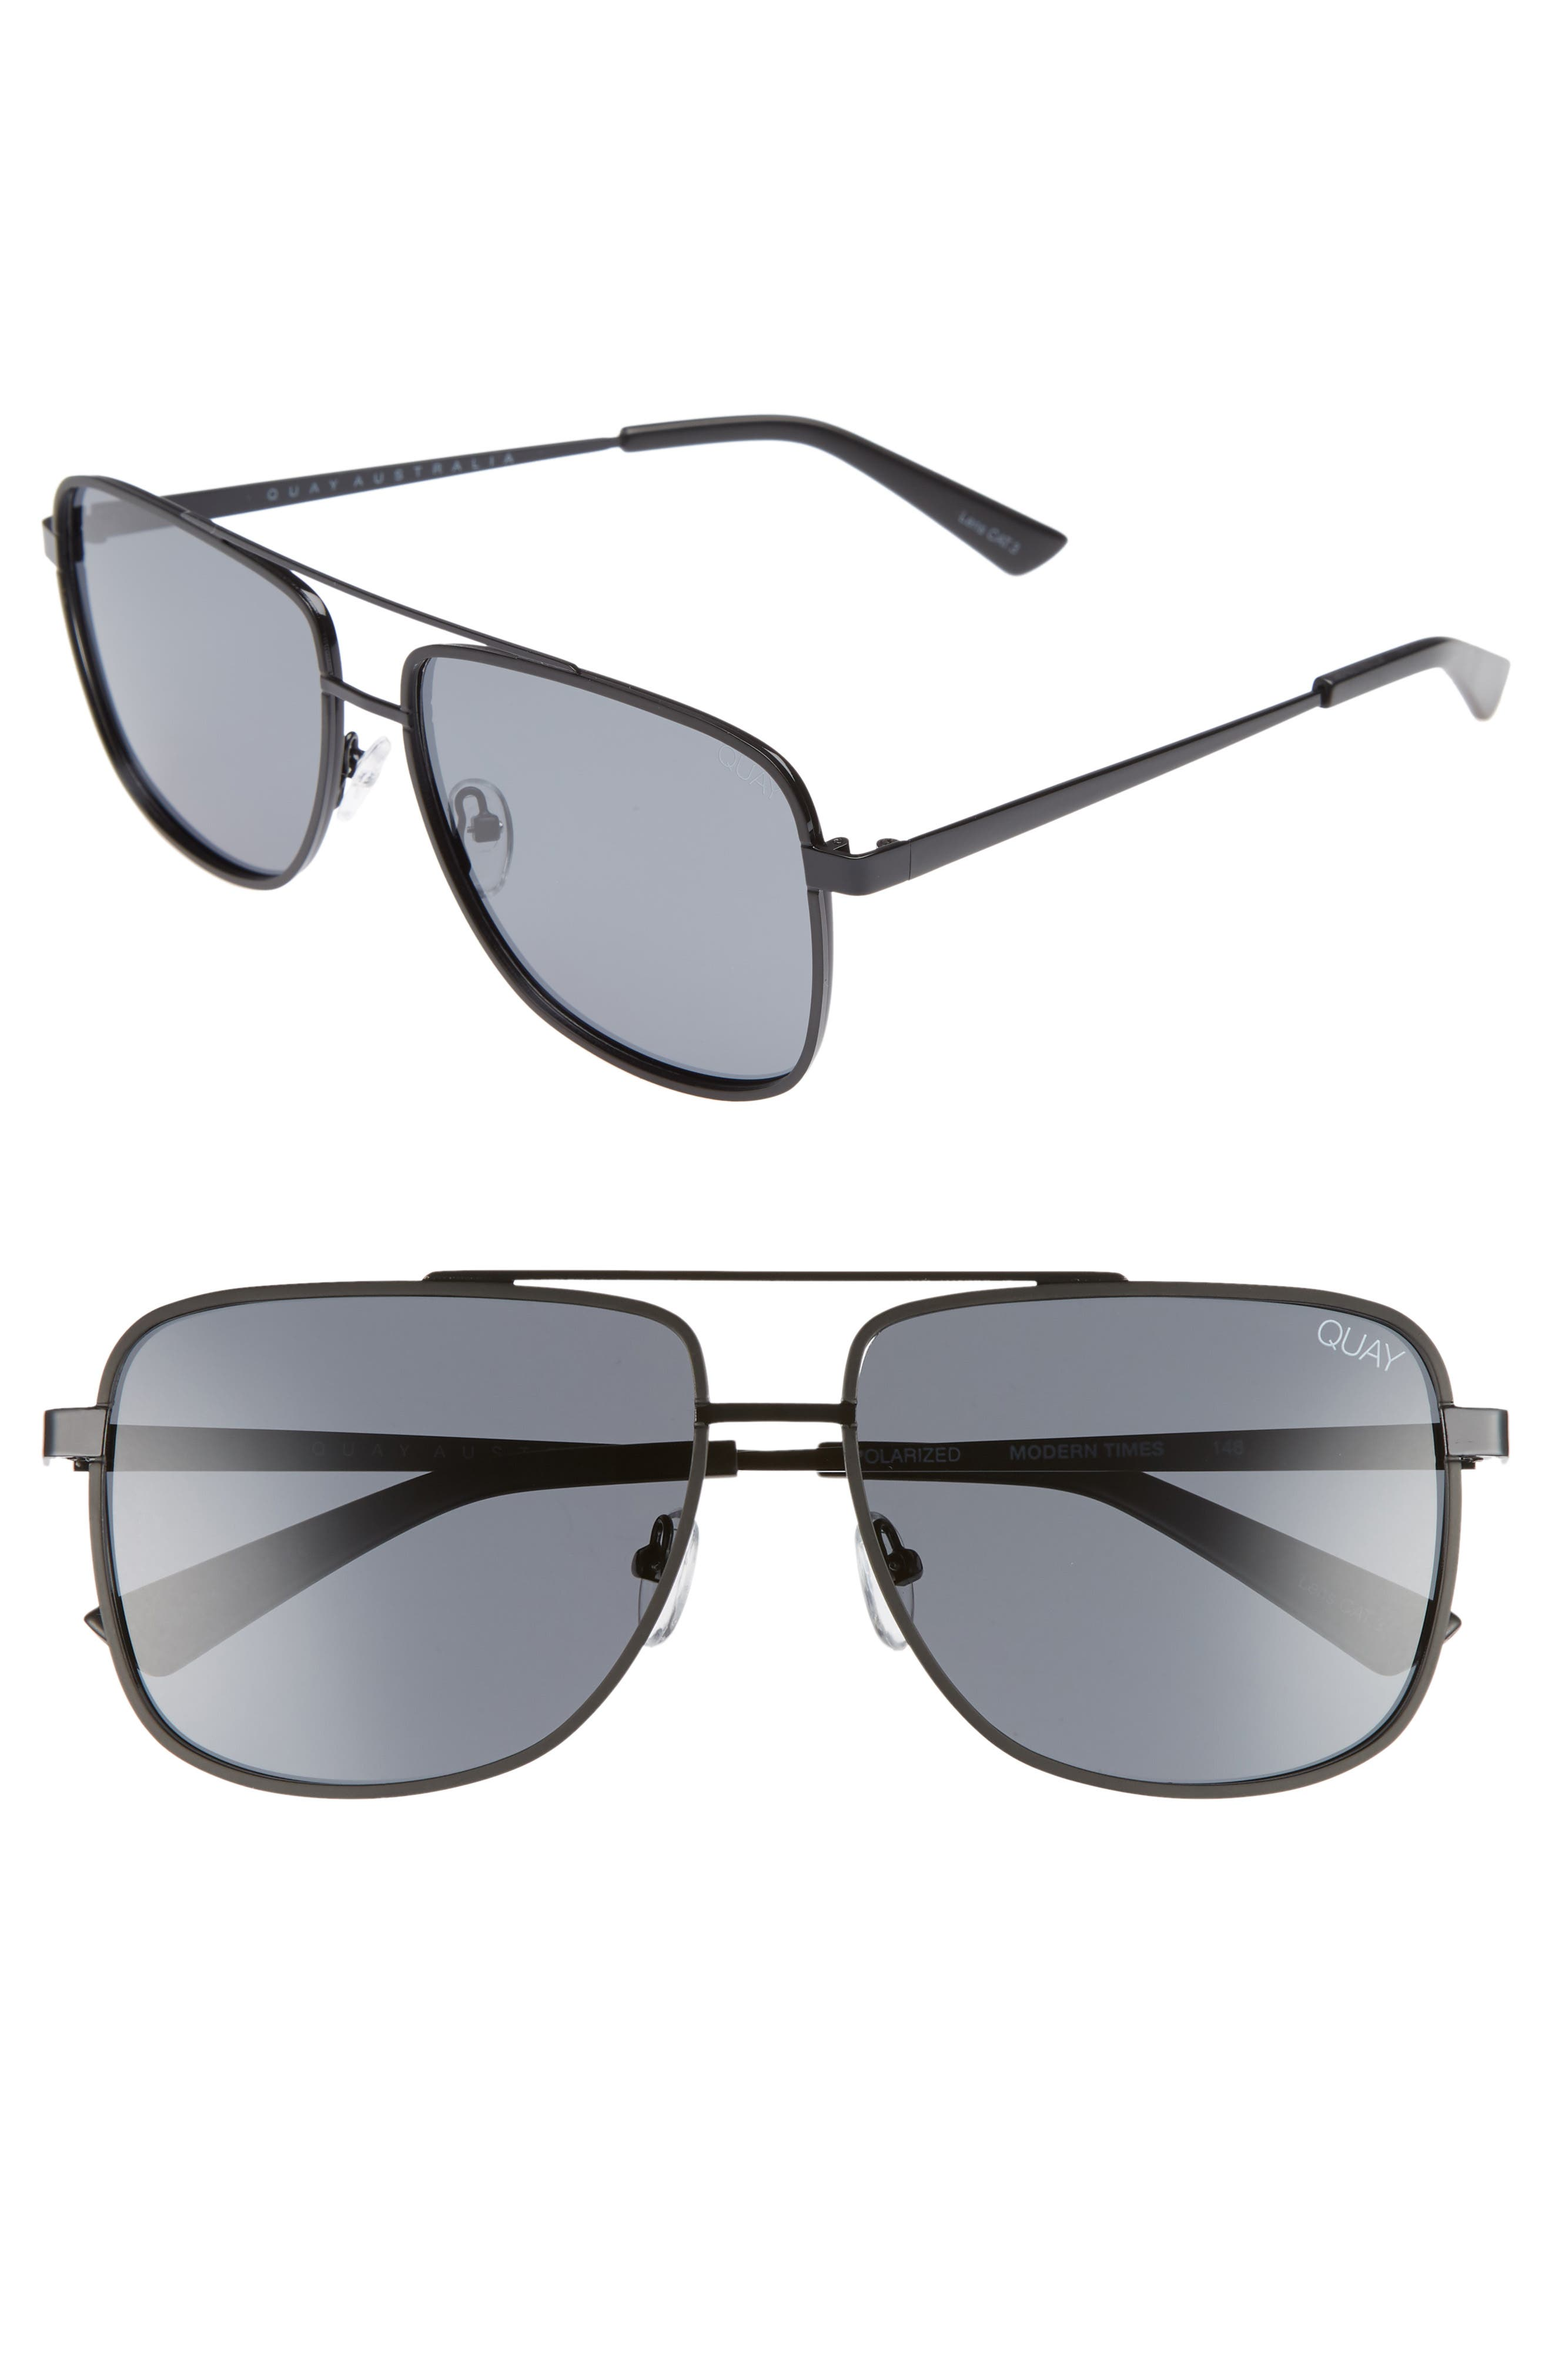 Modern Times 57mm Polarized Aviator Sunglasses,                             Main thumbnail 1, color,                             Black / Smoke Lens